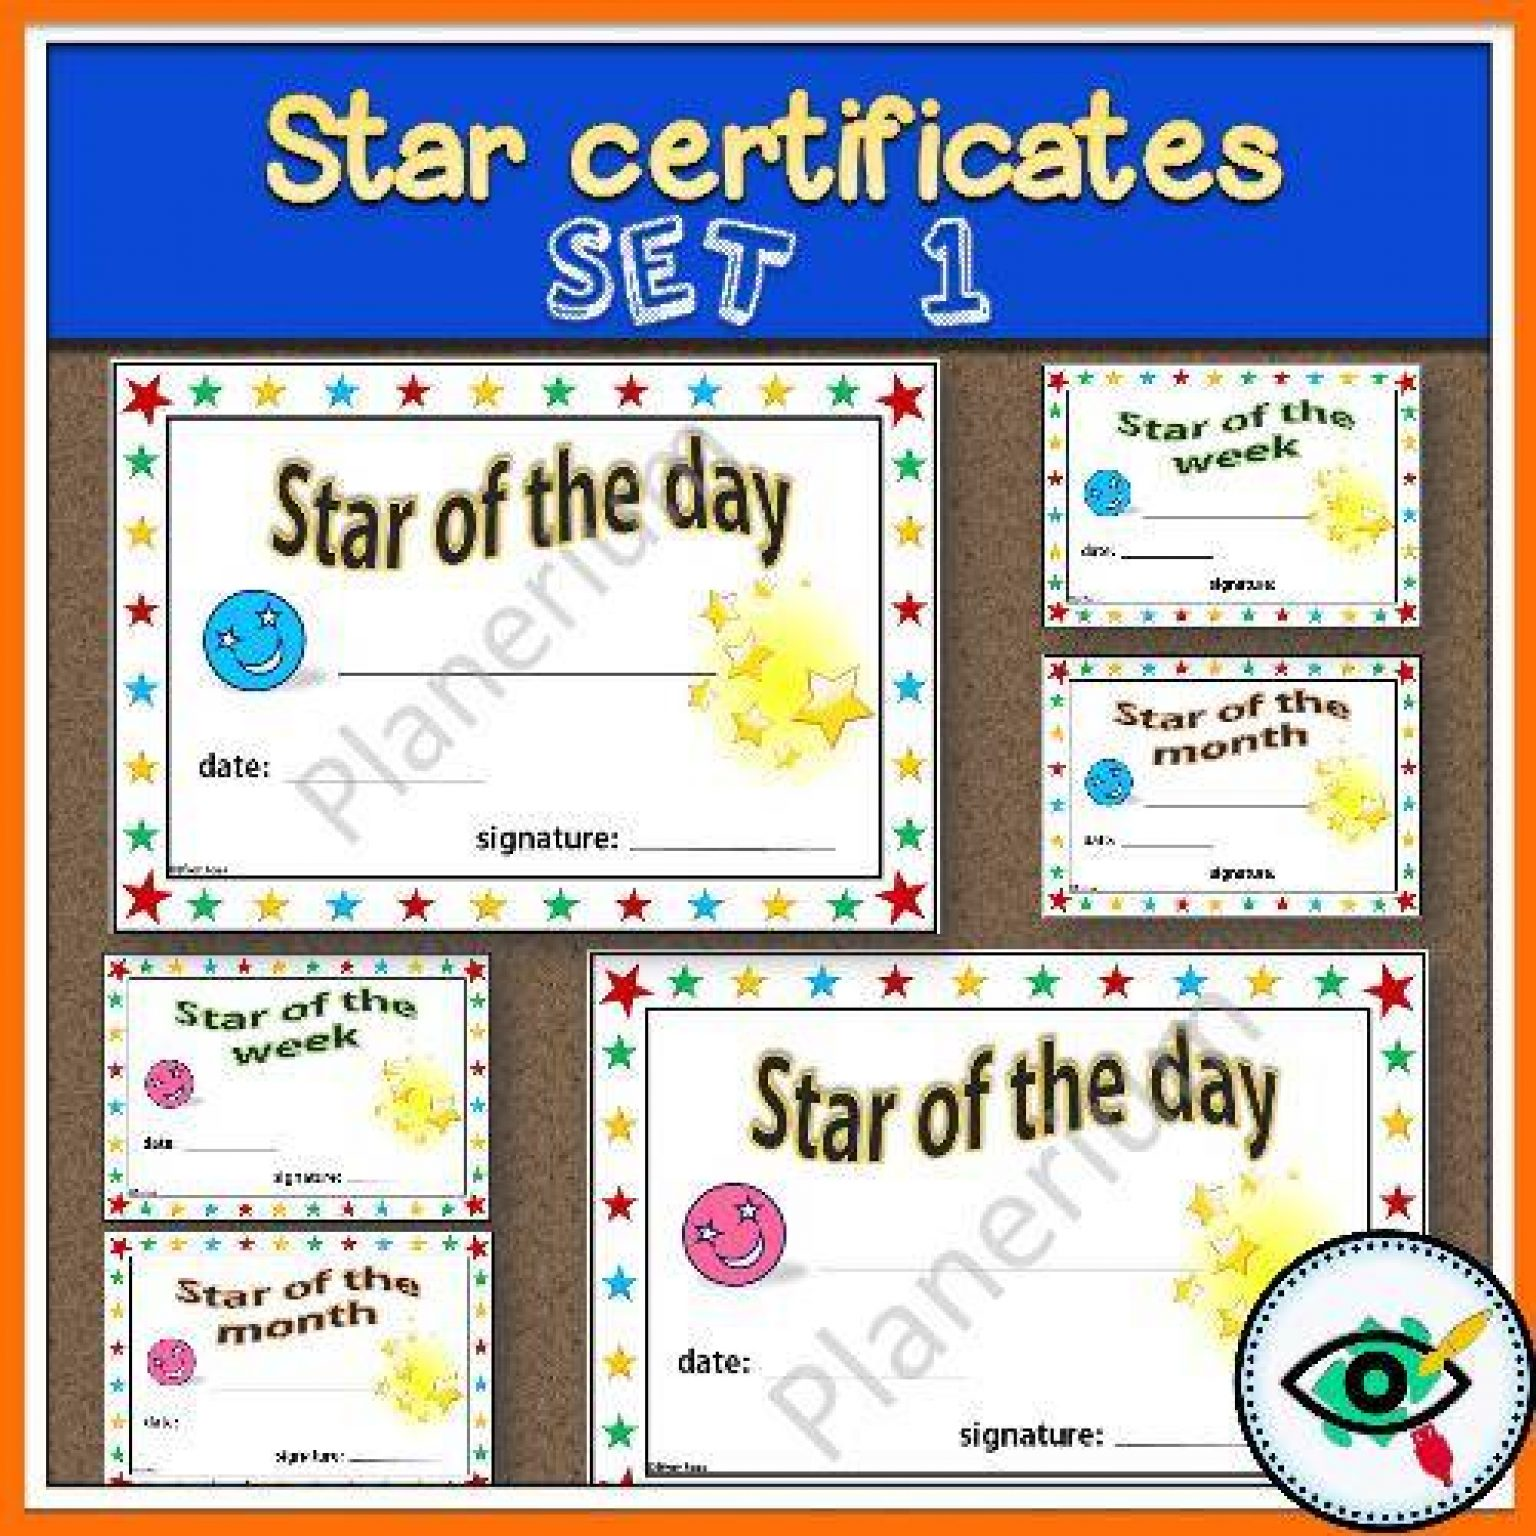 awards_rewards-star-certificates-g2-6-title1_resized